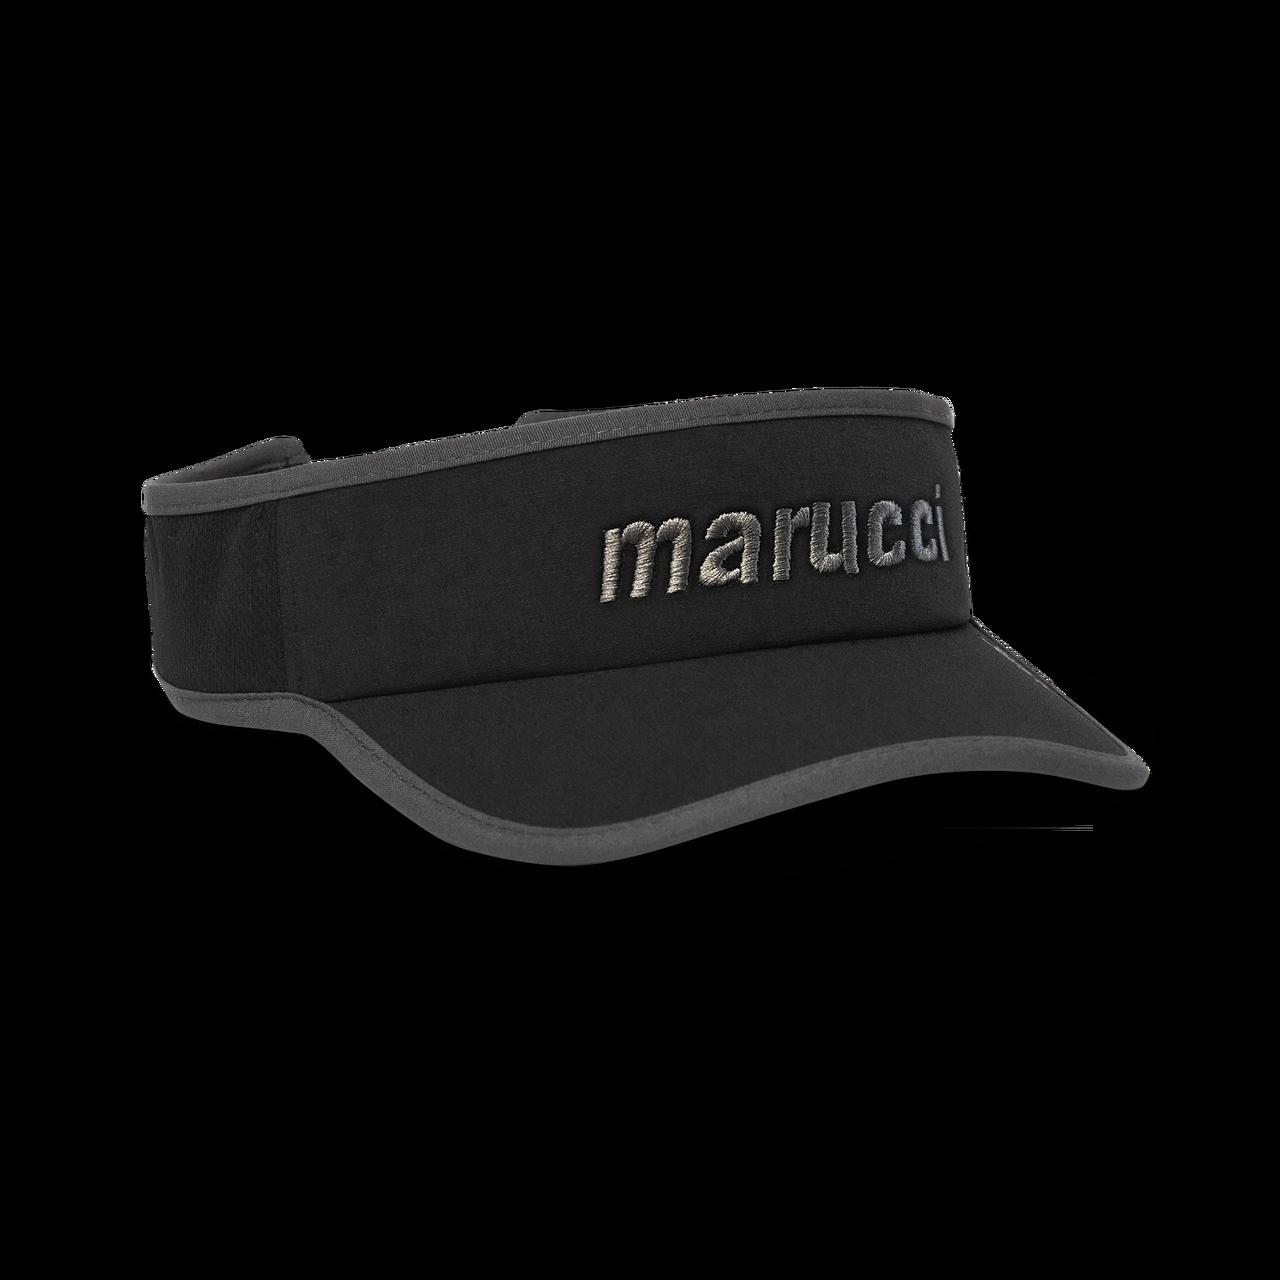 47cf88b32d1 Marucci Visor - Marucci Sports